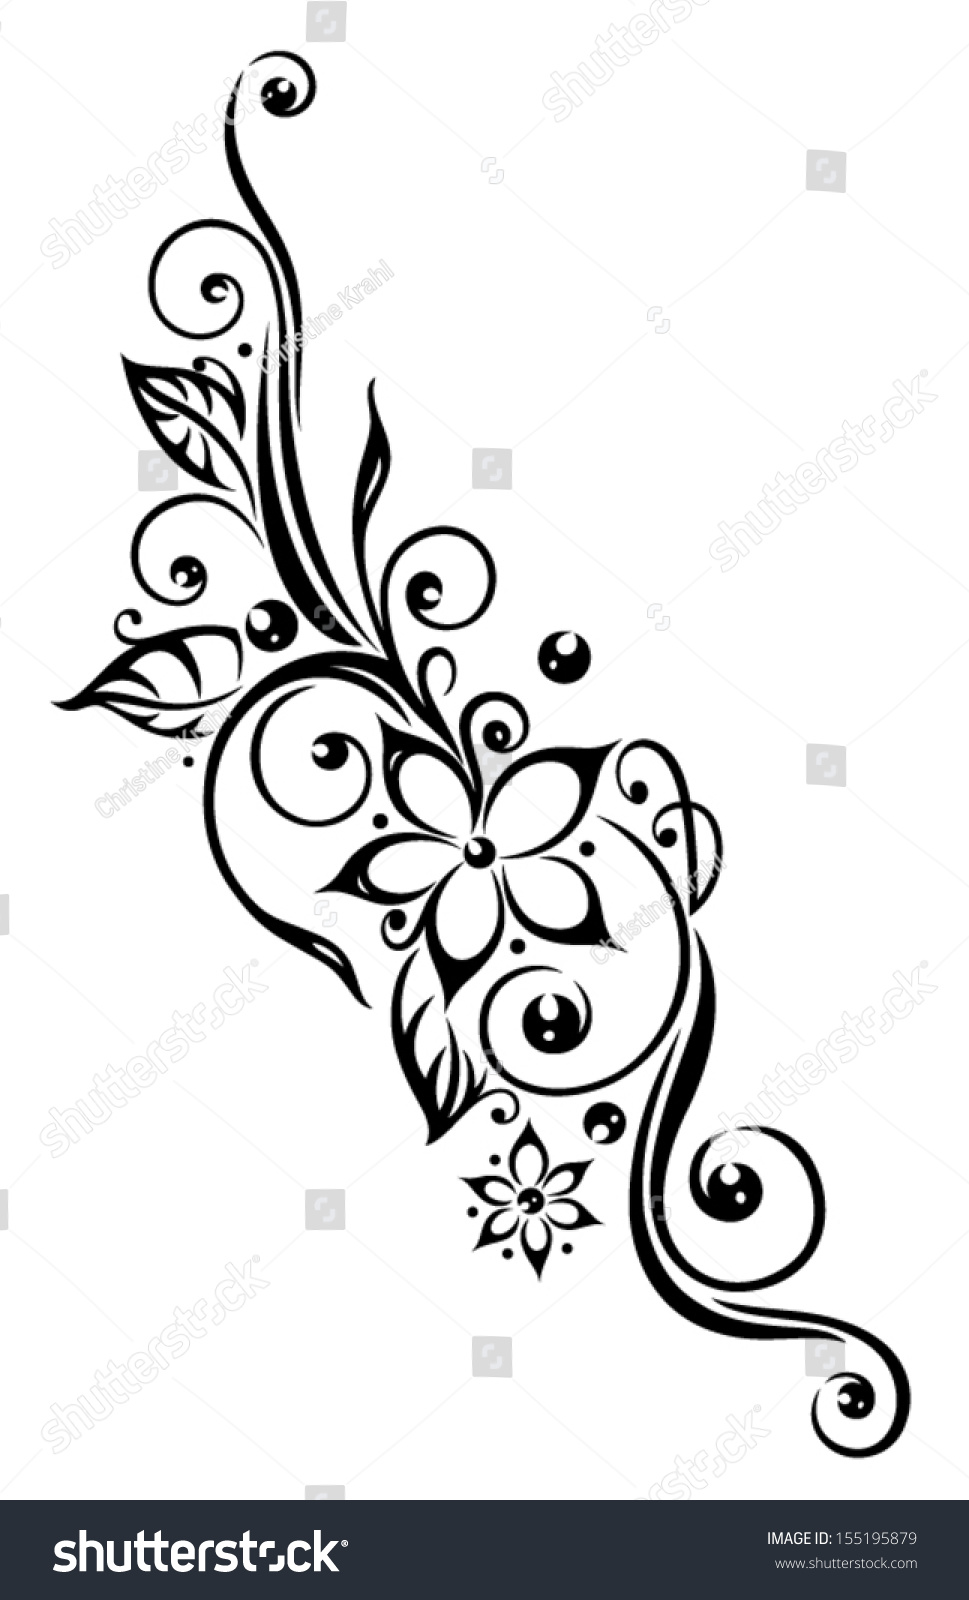 black flowers illustration tribal tattoo style stock vector 155195879 shutterstock. Black Bedroom Furniture Sets. Home Design Ideas